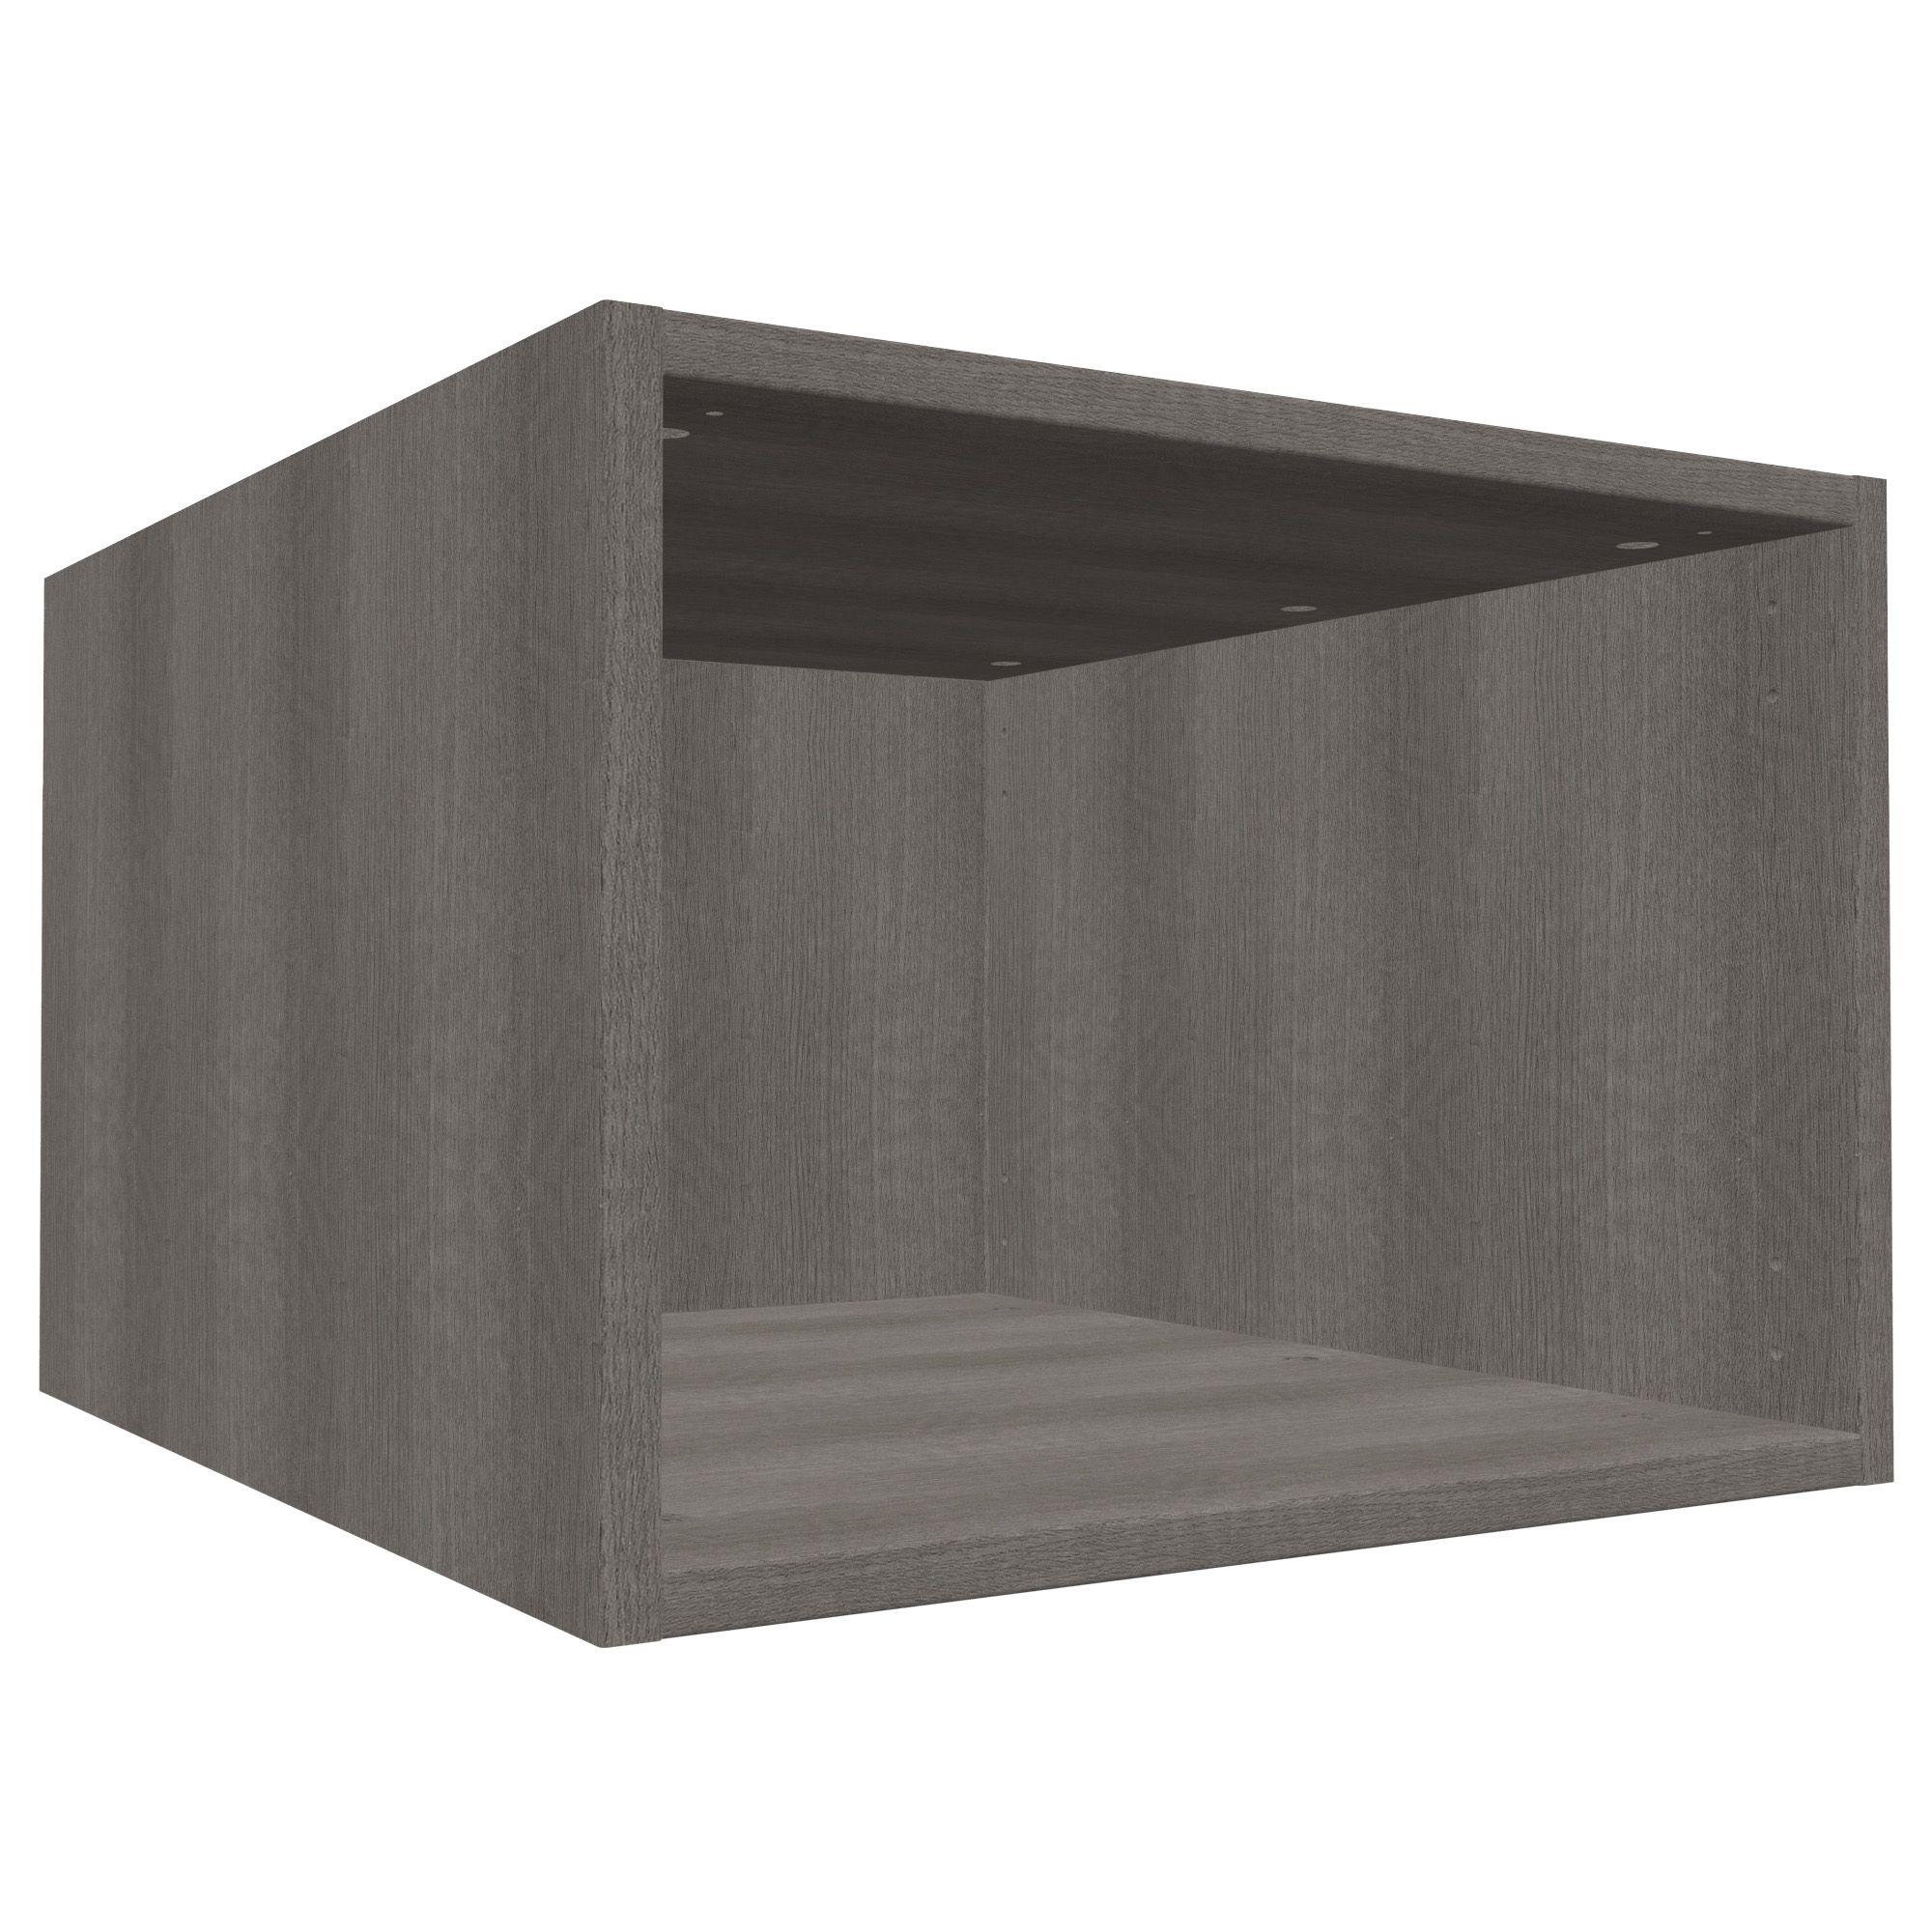 Darwin Modular Grey Oak Effect Bridging Cabinet (h)352mm (w)499mm (d)566mm